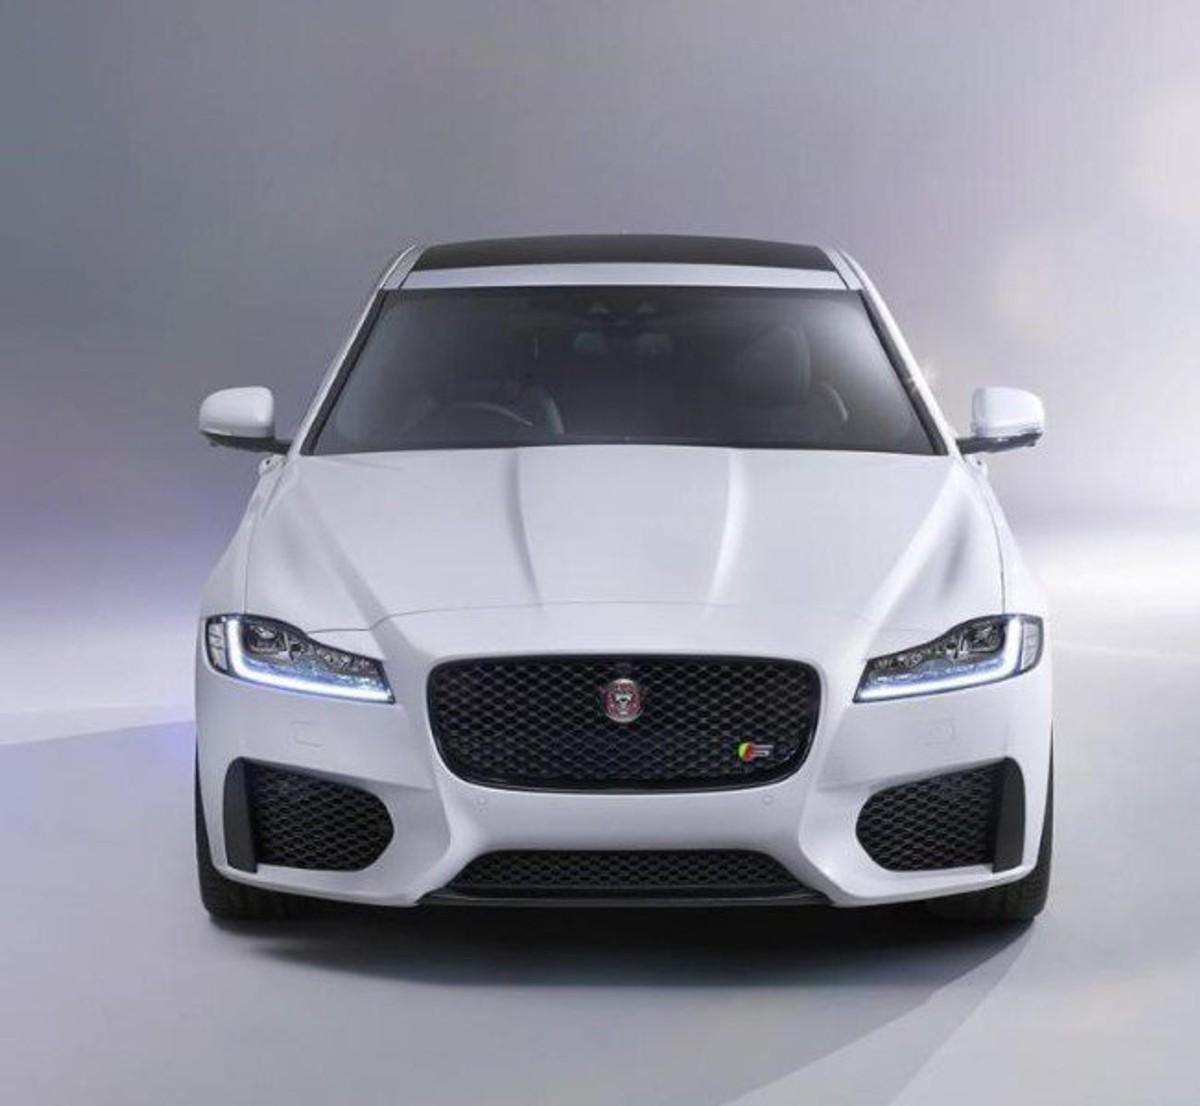 The New Jaguar: Jaguar XF (2016) Details Revealed With Video